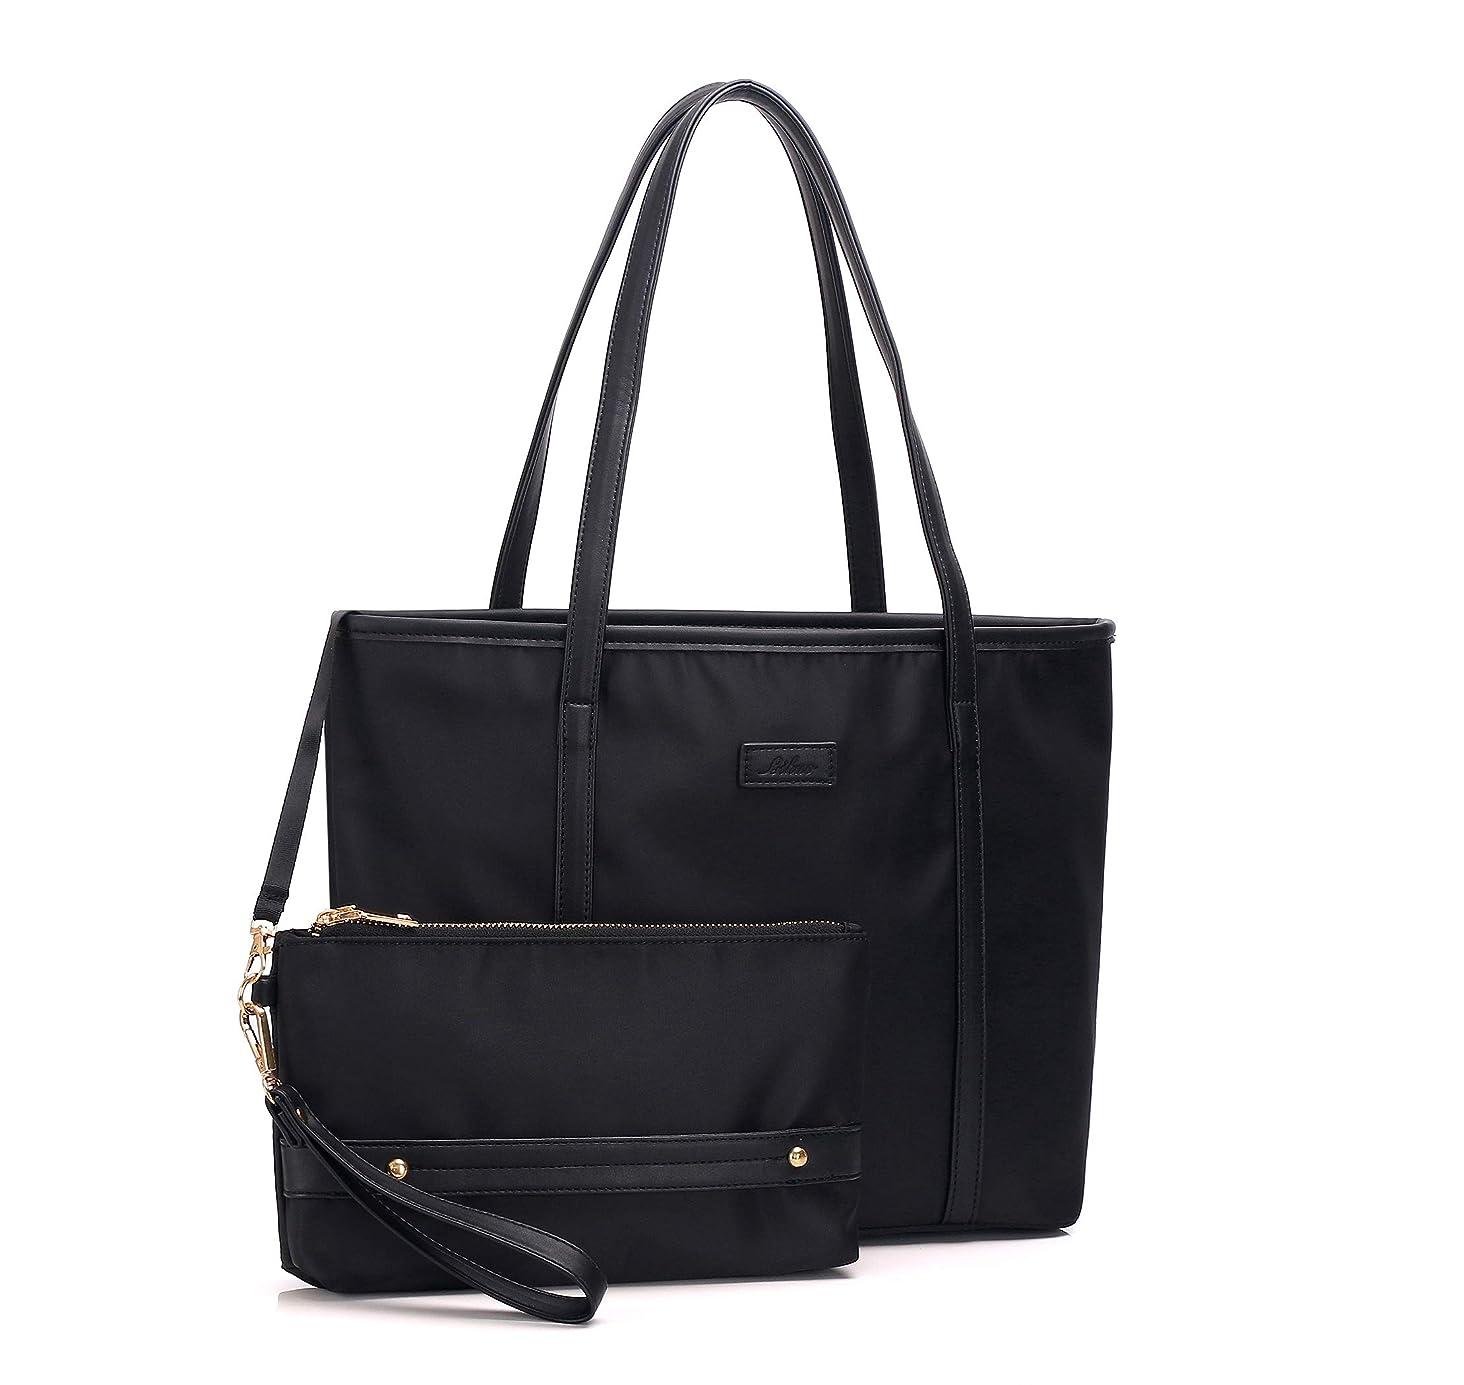 Women's Patent Leather & Oxford Nylon Handbags Designer Totes Purse Satchels Shoulder Handbag Fashion Embossed Top Handle Bag